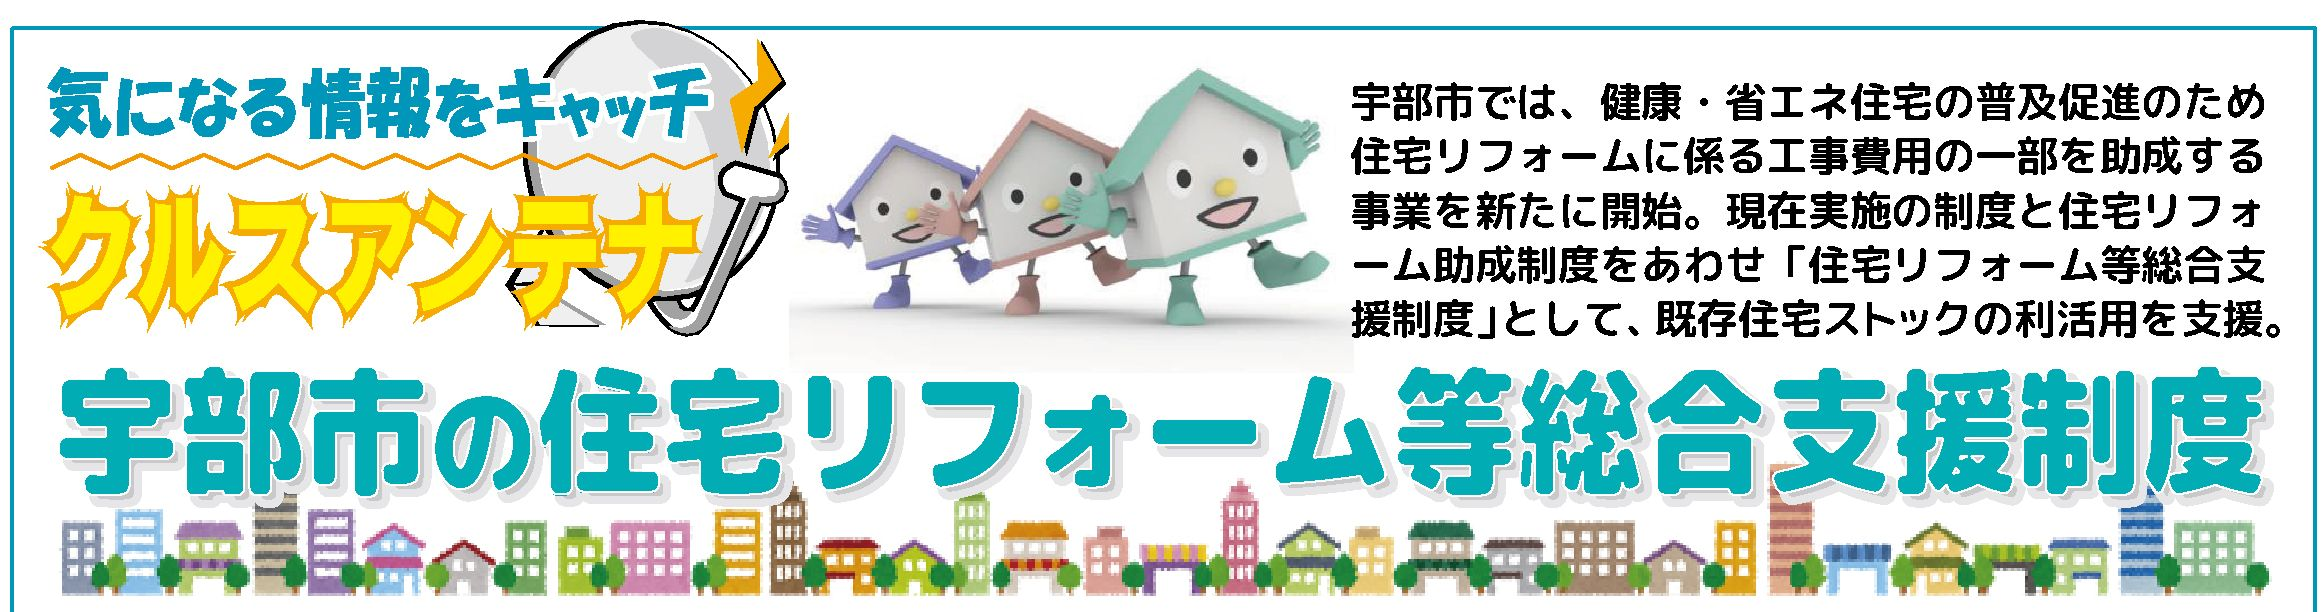 KuraSi-natu-sin103-16.jpg